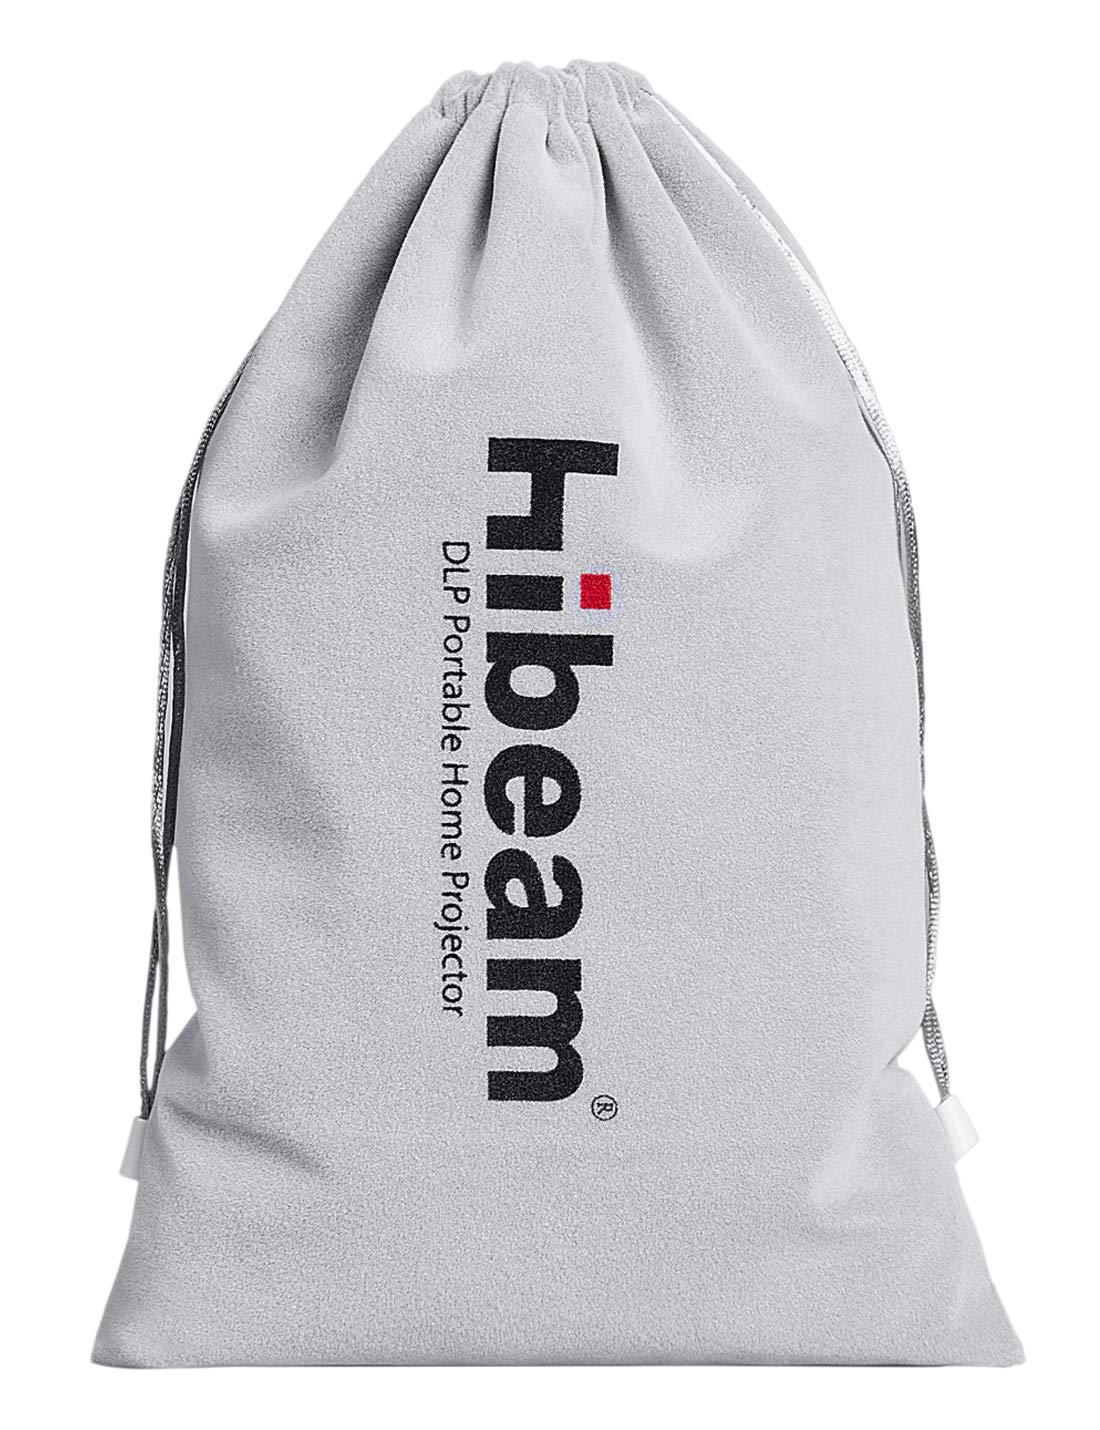 Bolsa de Tela de Terciopelo de Hibeam, 12.5 Pulgadas x 8.5 ...